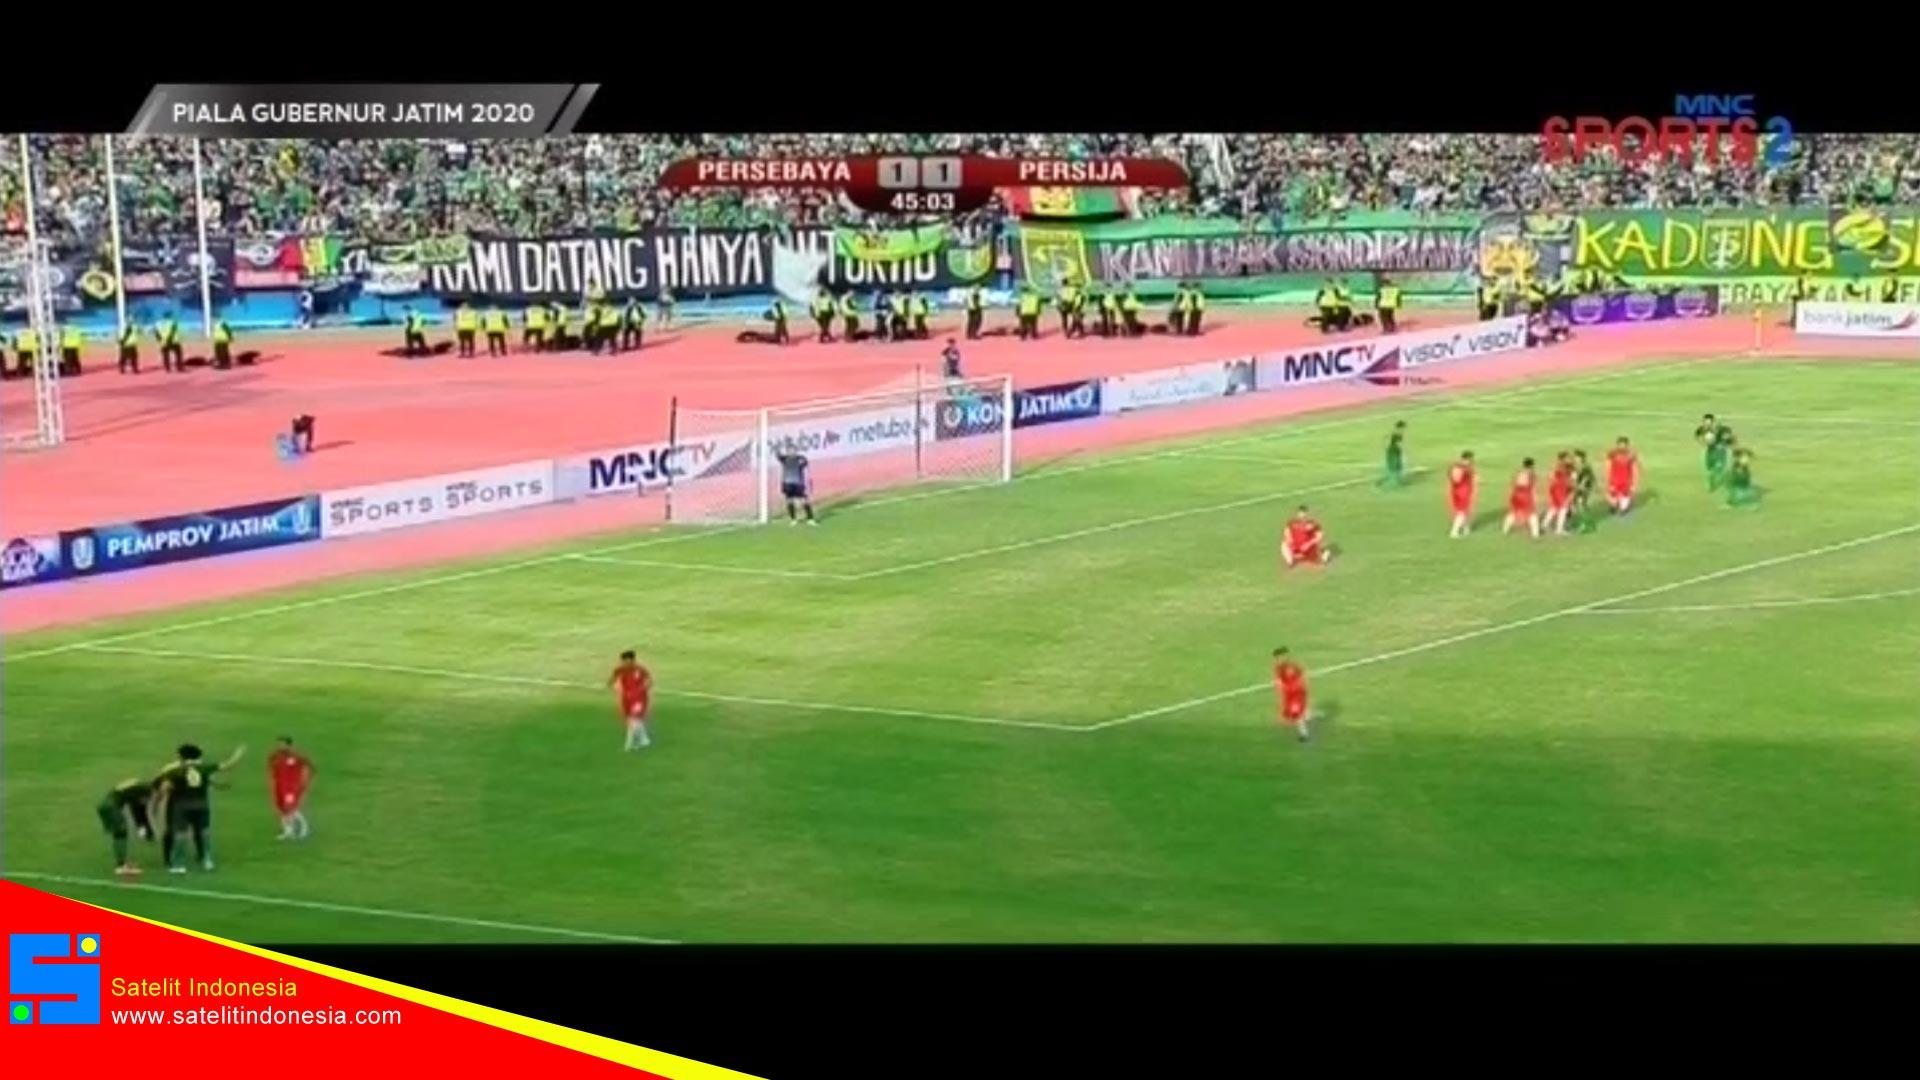 Frekuensi siaran MNC Sports 2 di satelit Palapa D Terbaru